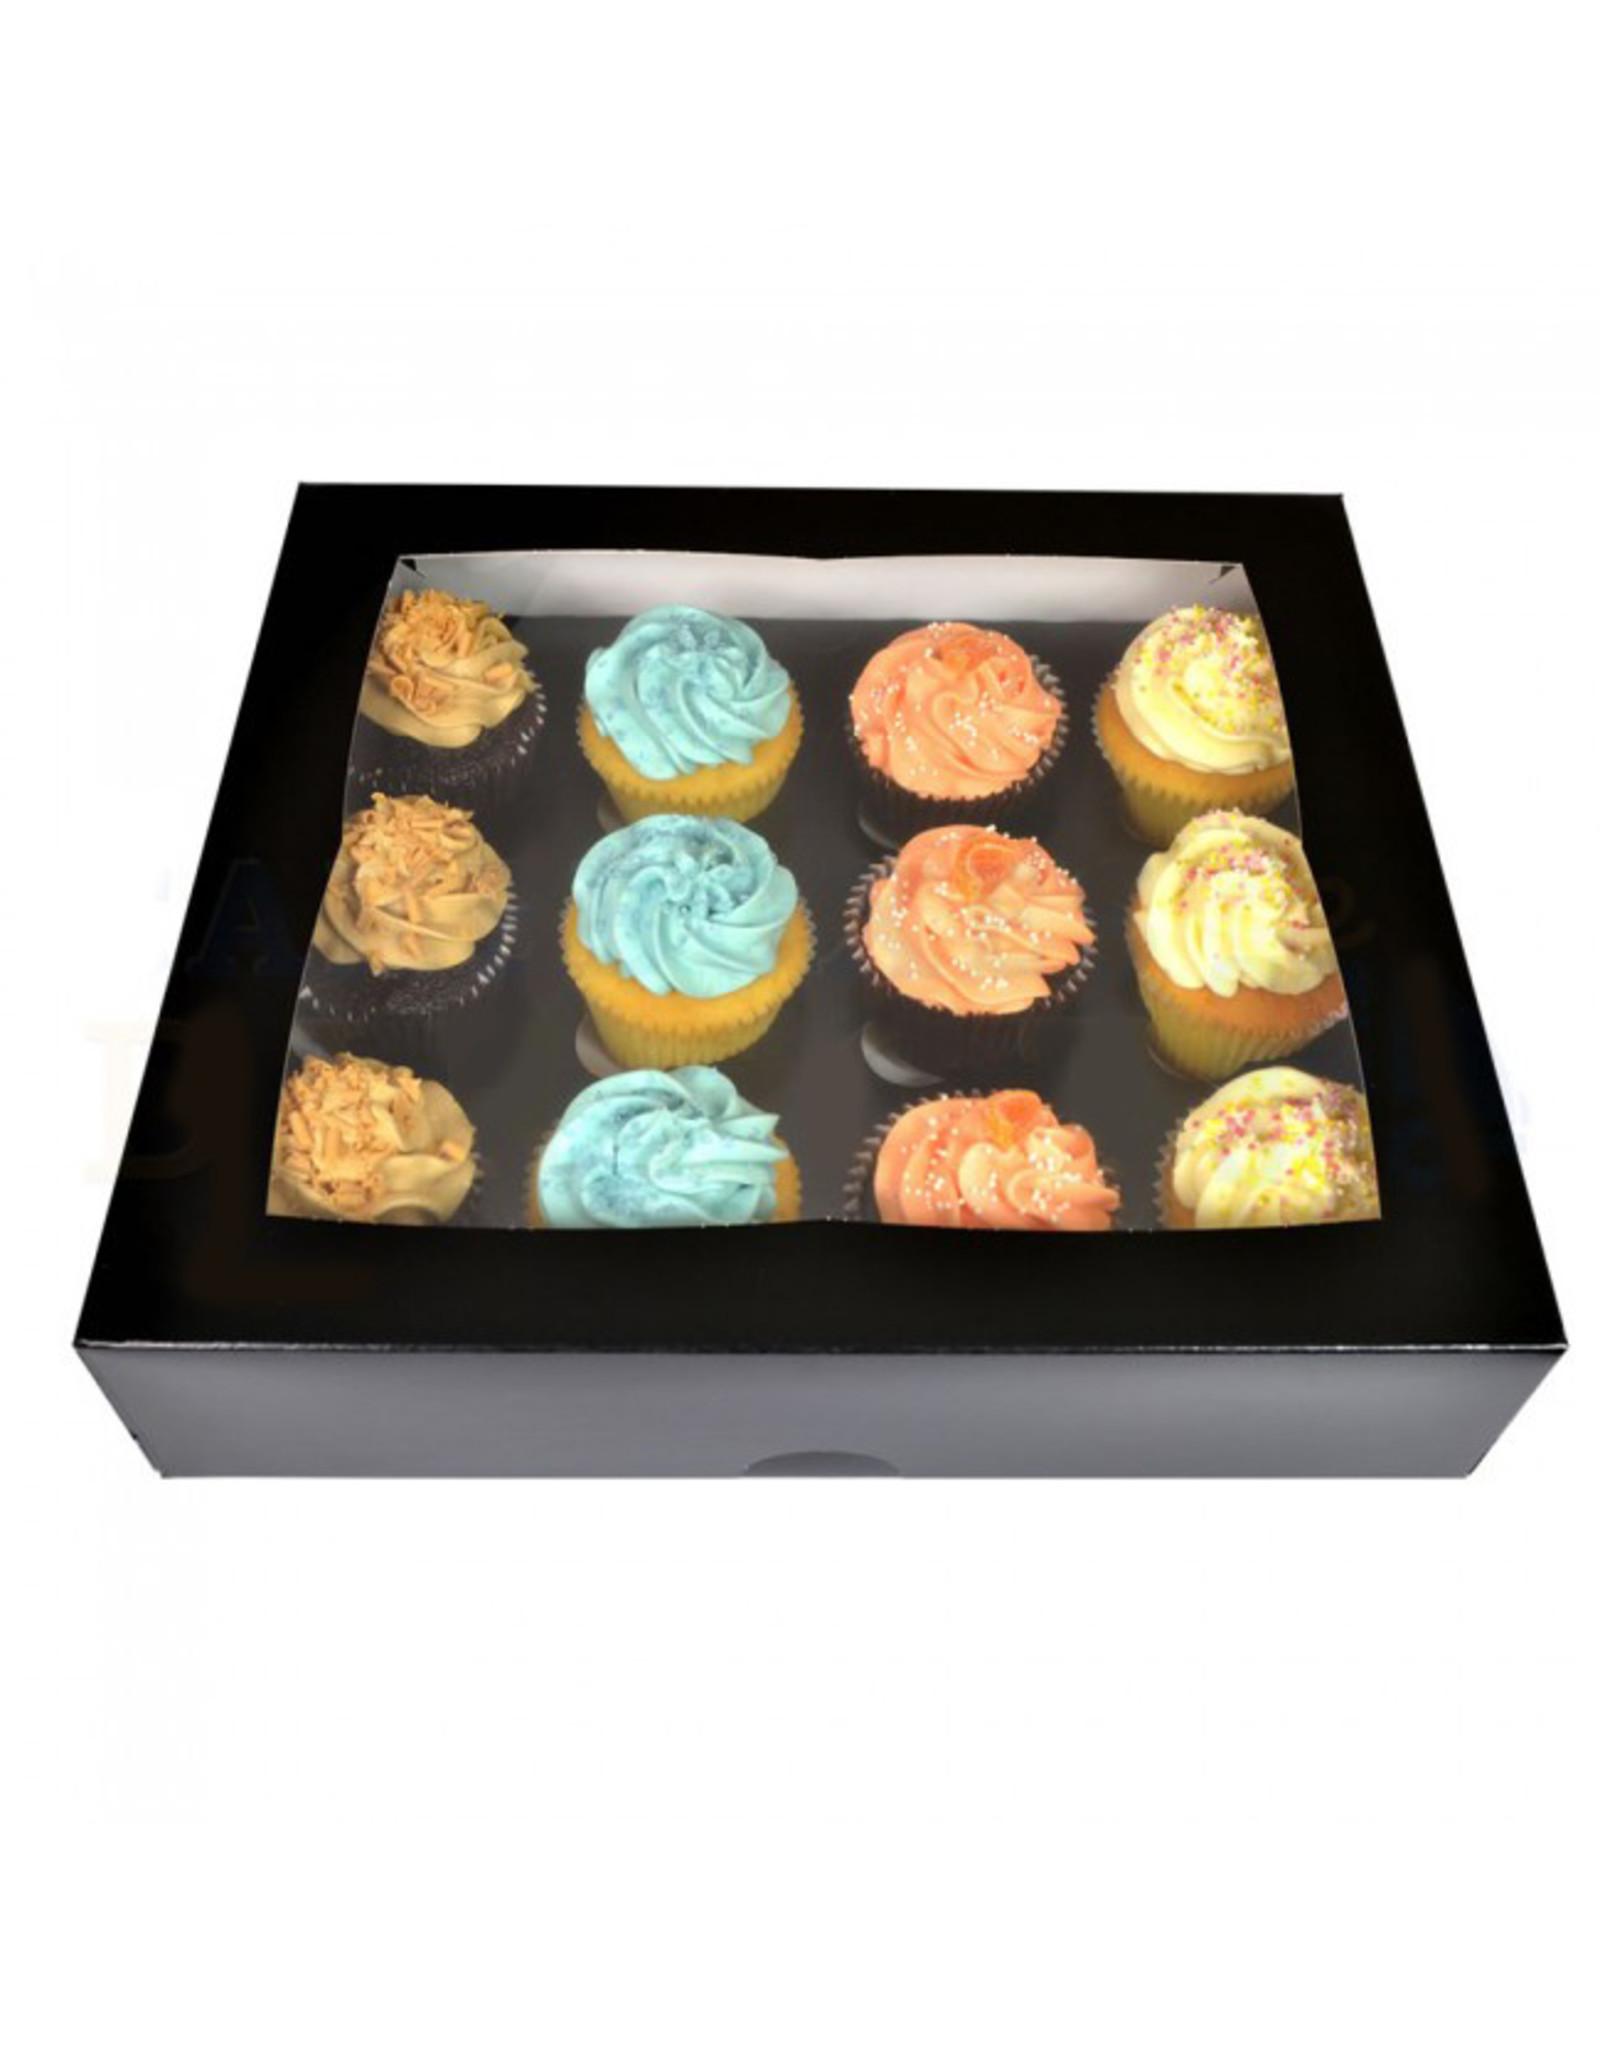 Black box for 12 cupcakes (per 25 pieces)